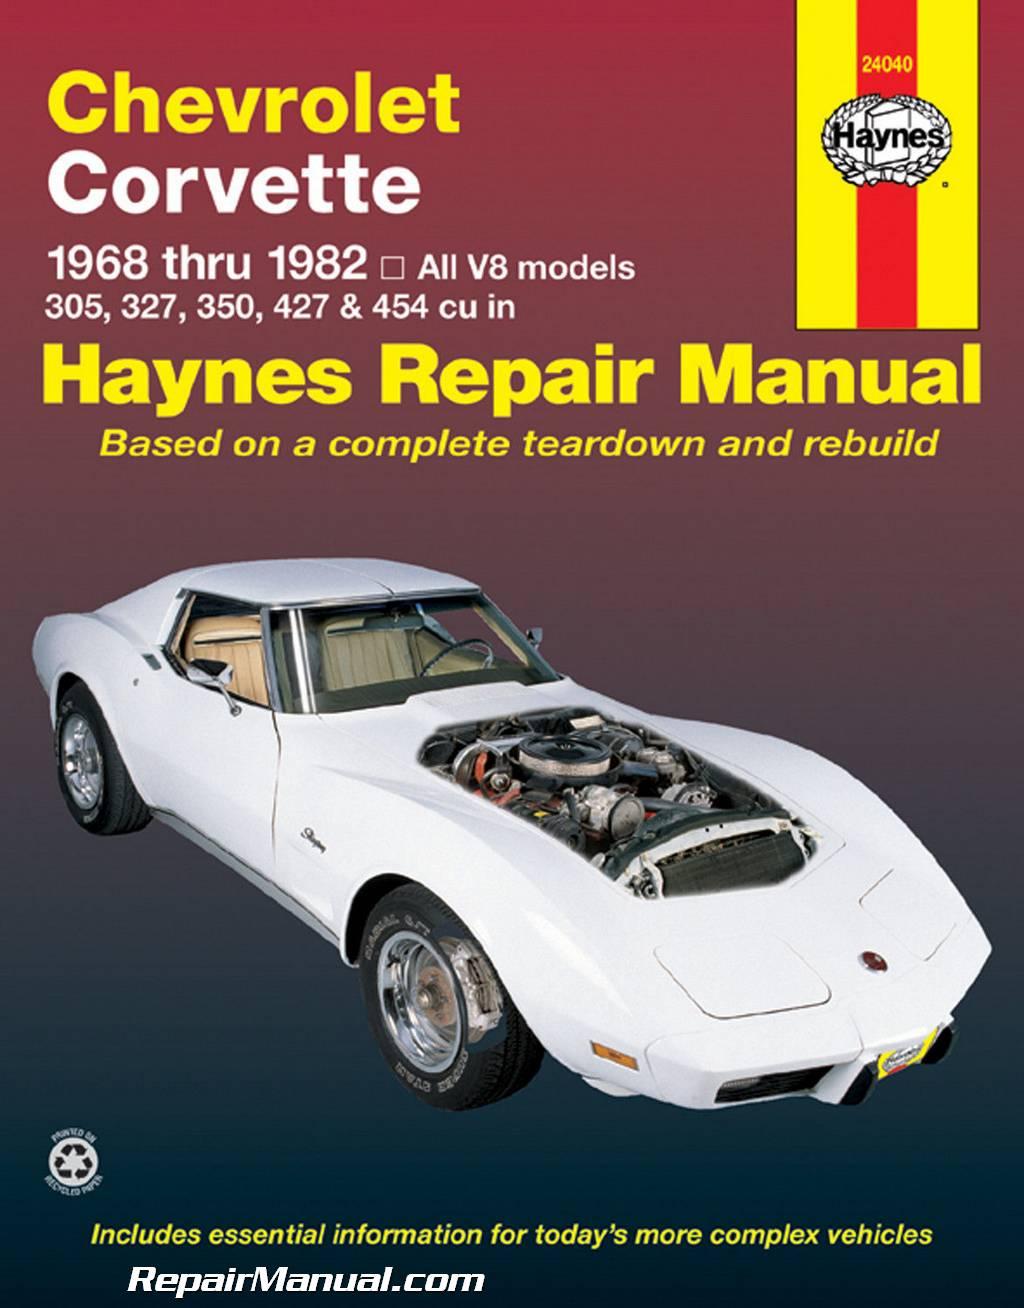 1968 1982 Chevrolet Corvette Haynes Service Repair Manual All V8 STINGRAY Chevy